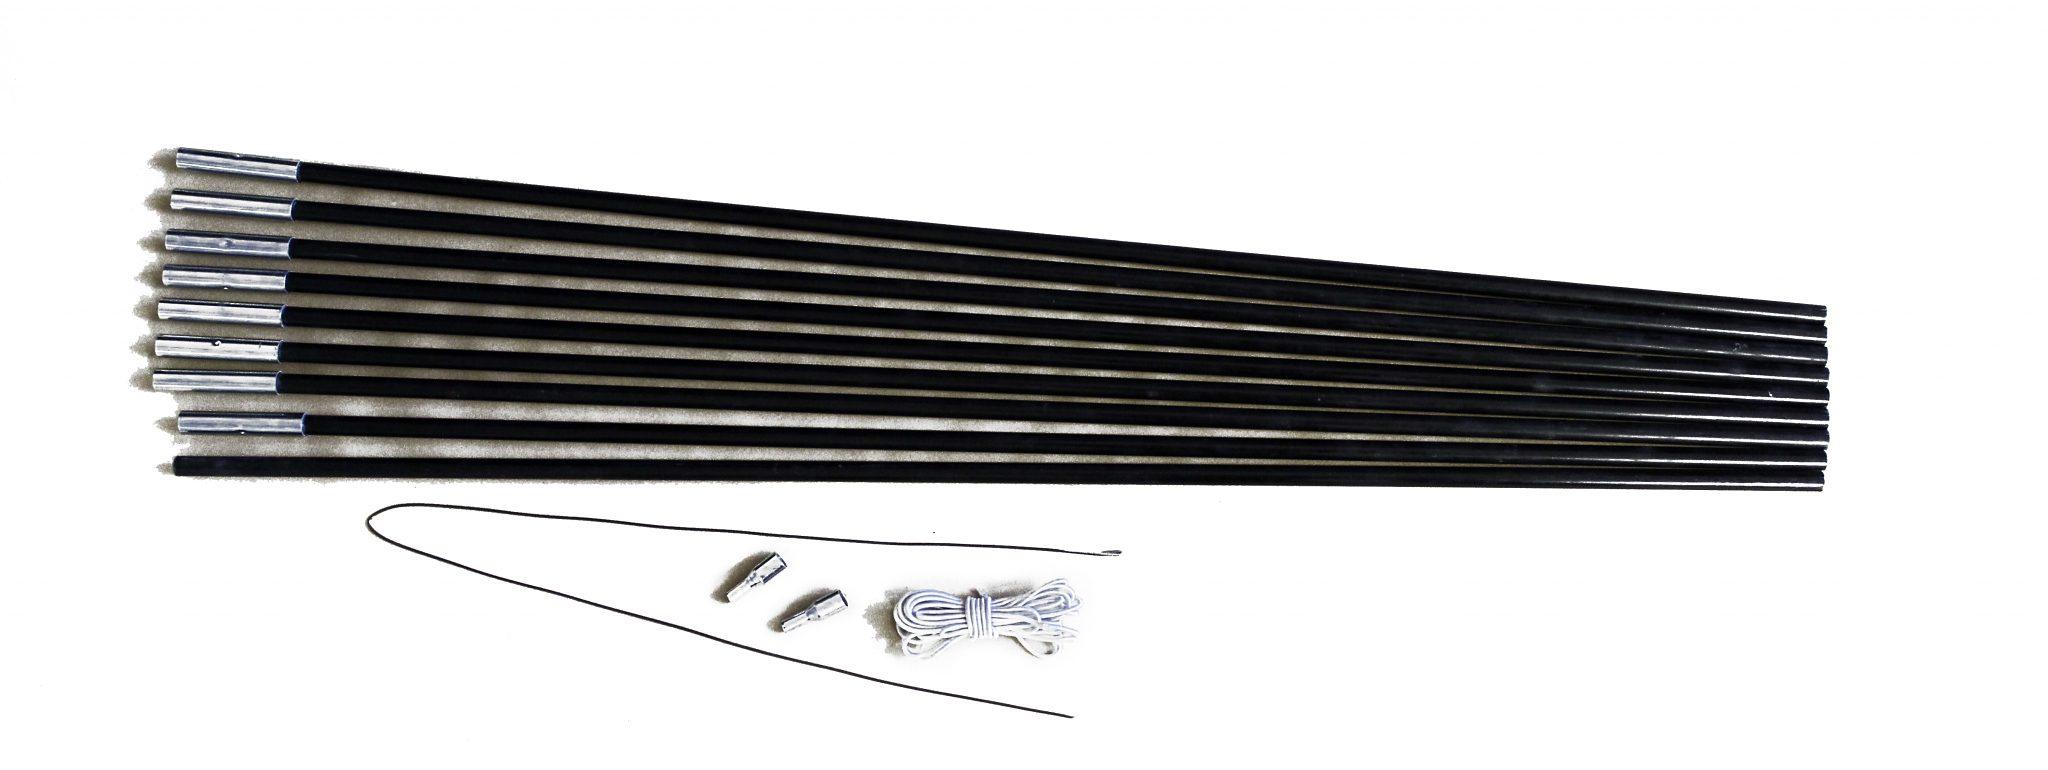 Relags Zelt »Fiberglasstange 7,75m x 11mm 9 Segmente«